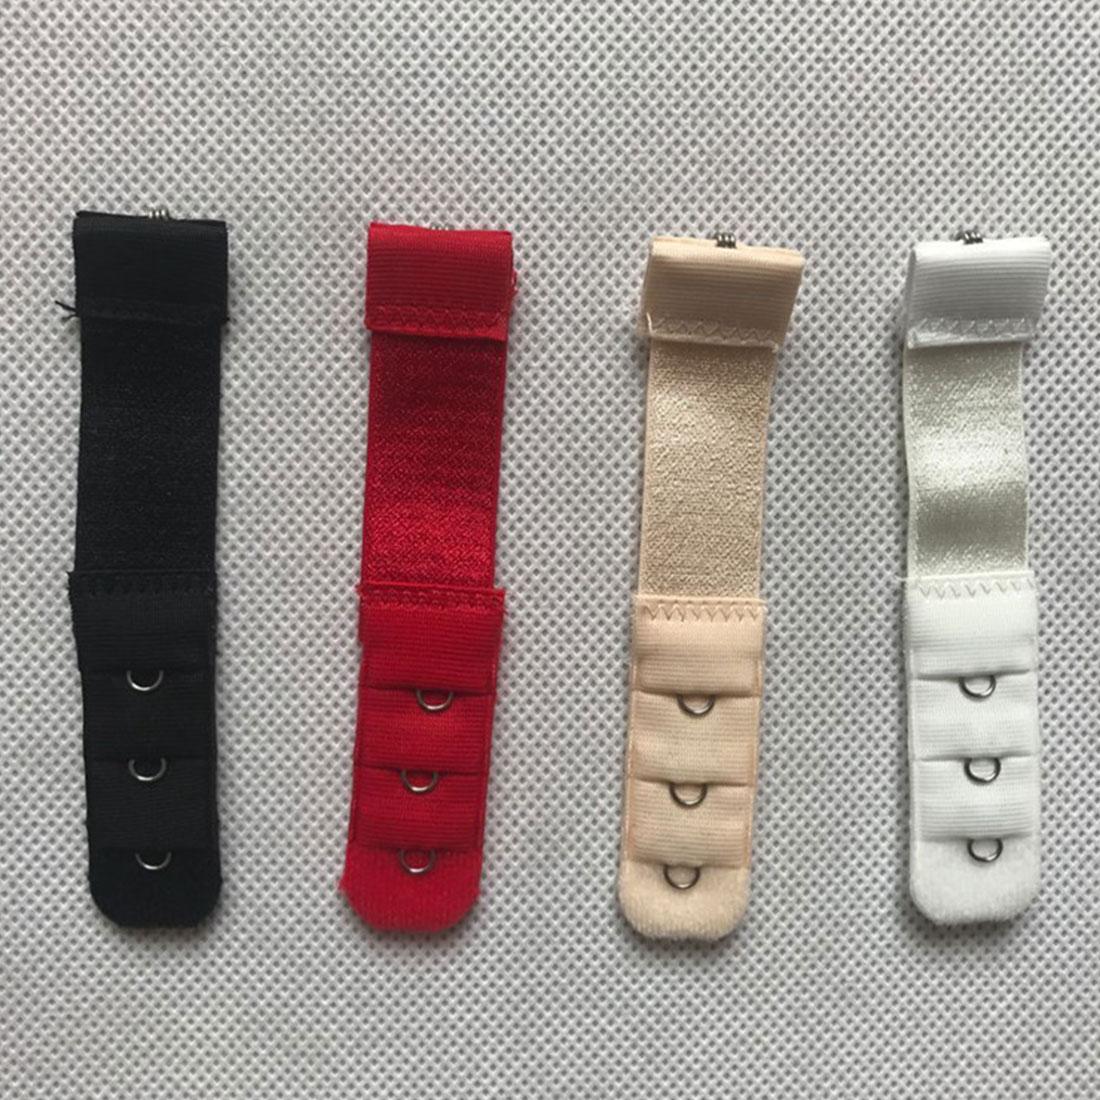 Hot 1pc 1 Rows 3 Hooks Bra Extender Nylon Clasp Extension Elastic On Strap Bra Extenders Adjustable Intimates Accessories